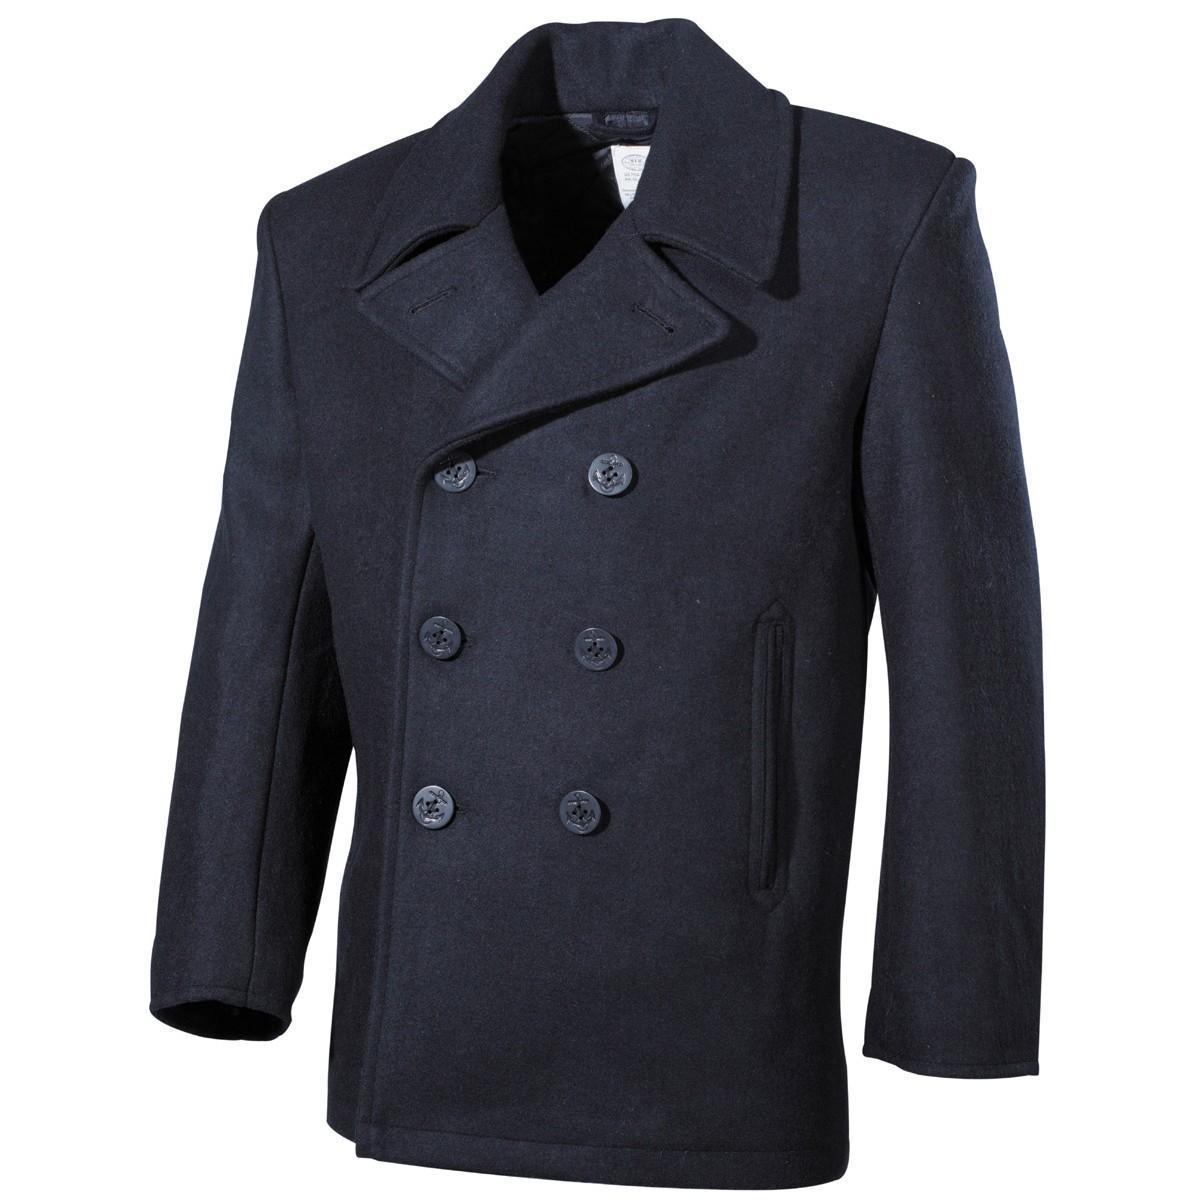 US Pea Coat MFH - modrý